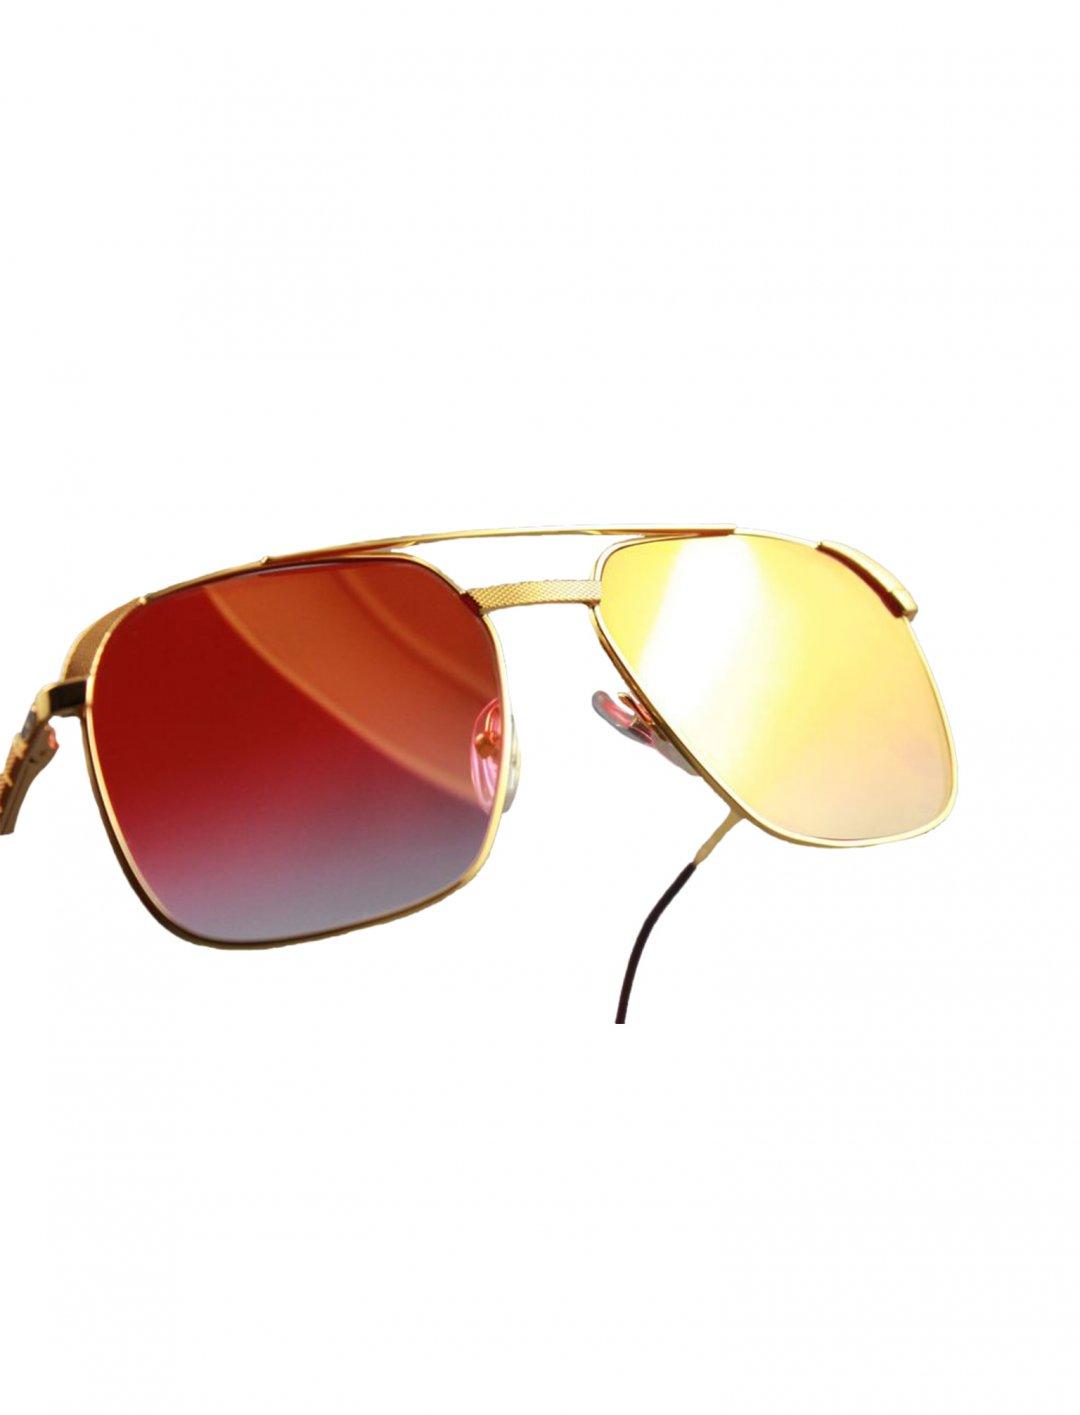 "Avelino's Hilton 995 Sunglasses {""id"":16,""product_section_id"":1,""name"":""Accessories"",""order"":15} Hilton"